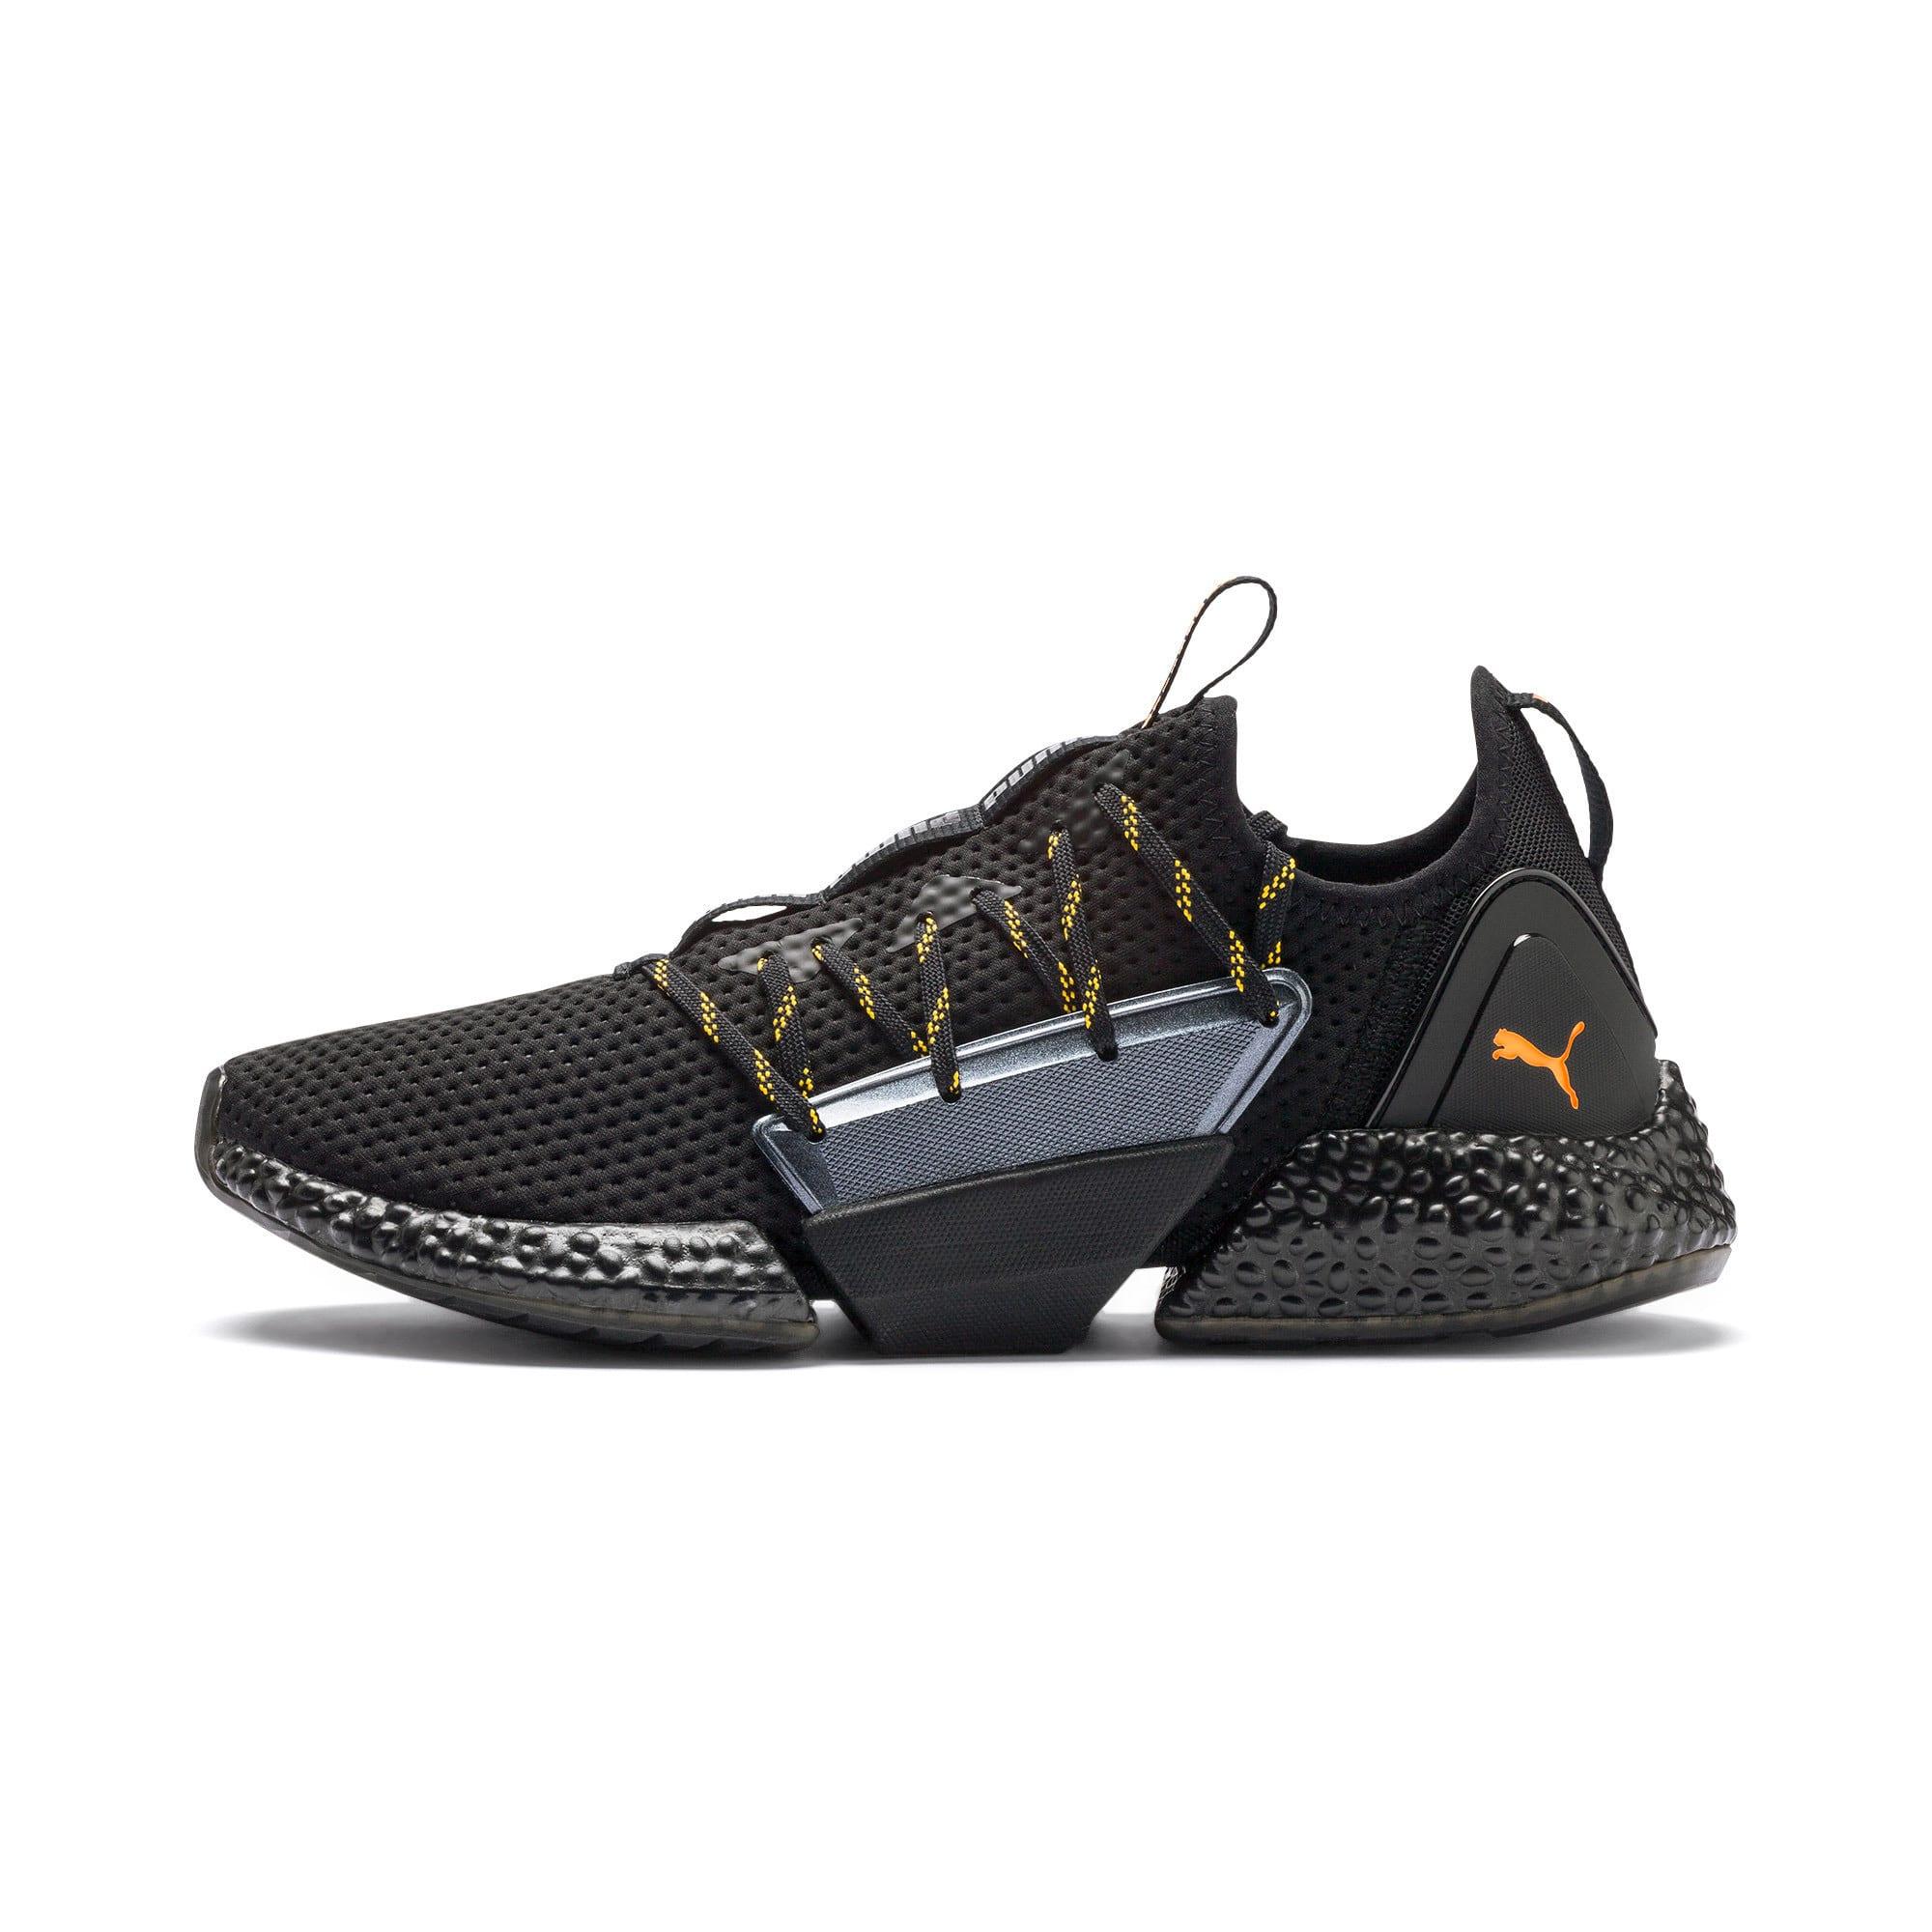 Thumbnail 1 of HYBRID Rocket Aero Men's Running Shoes, Puma Black-Puma Black, medium